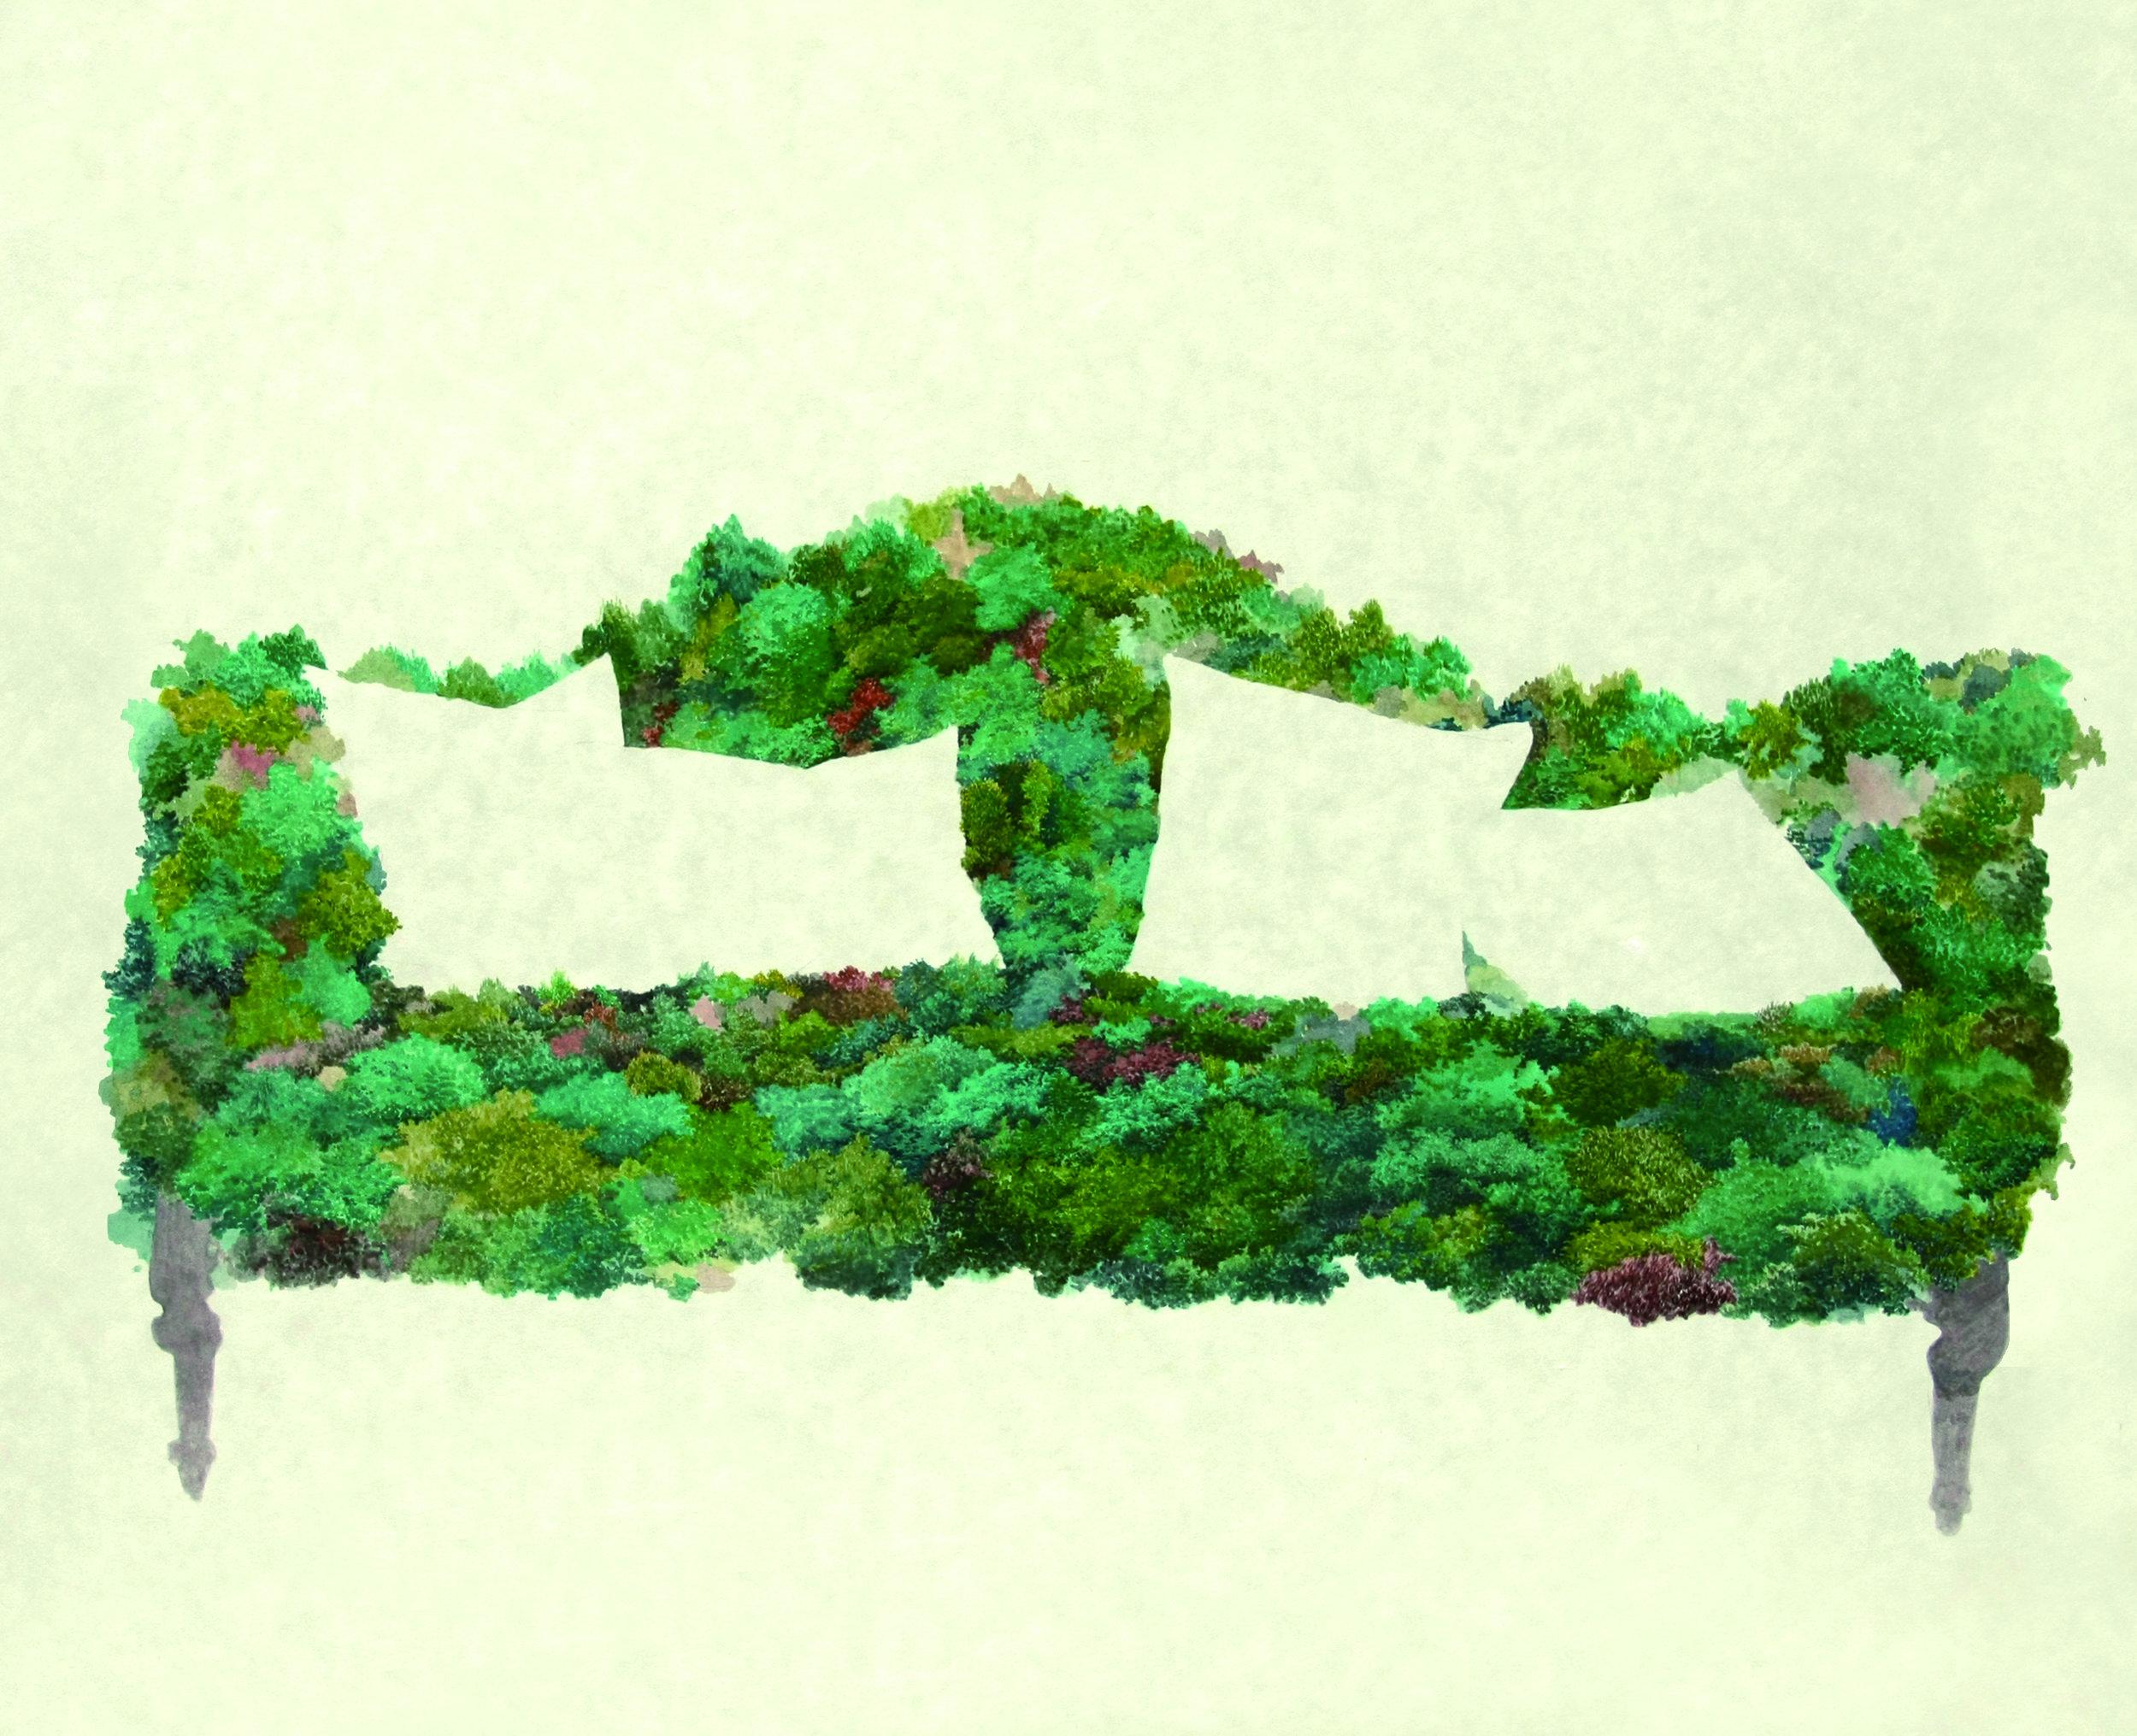 5_small.jpg